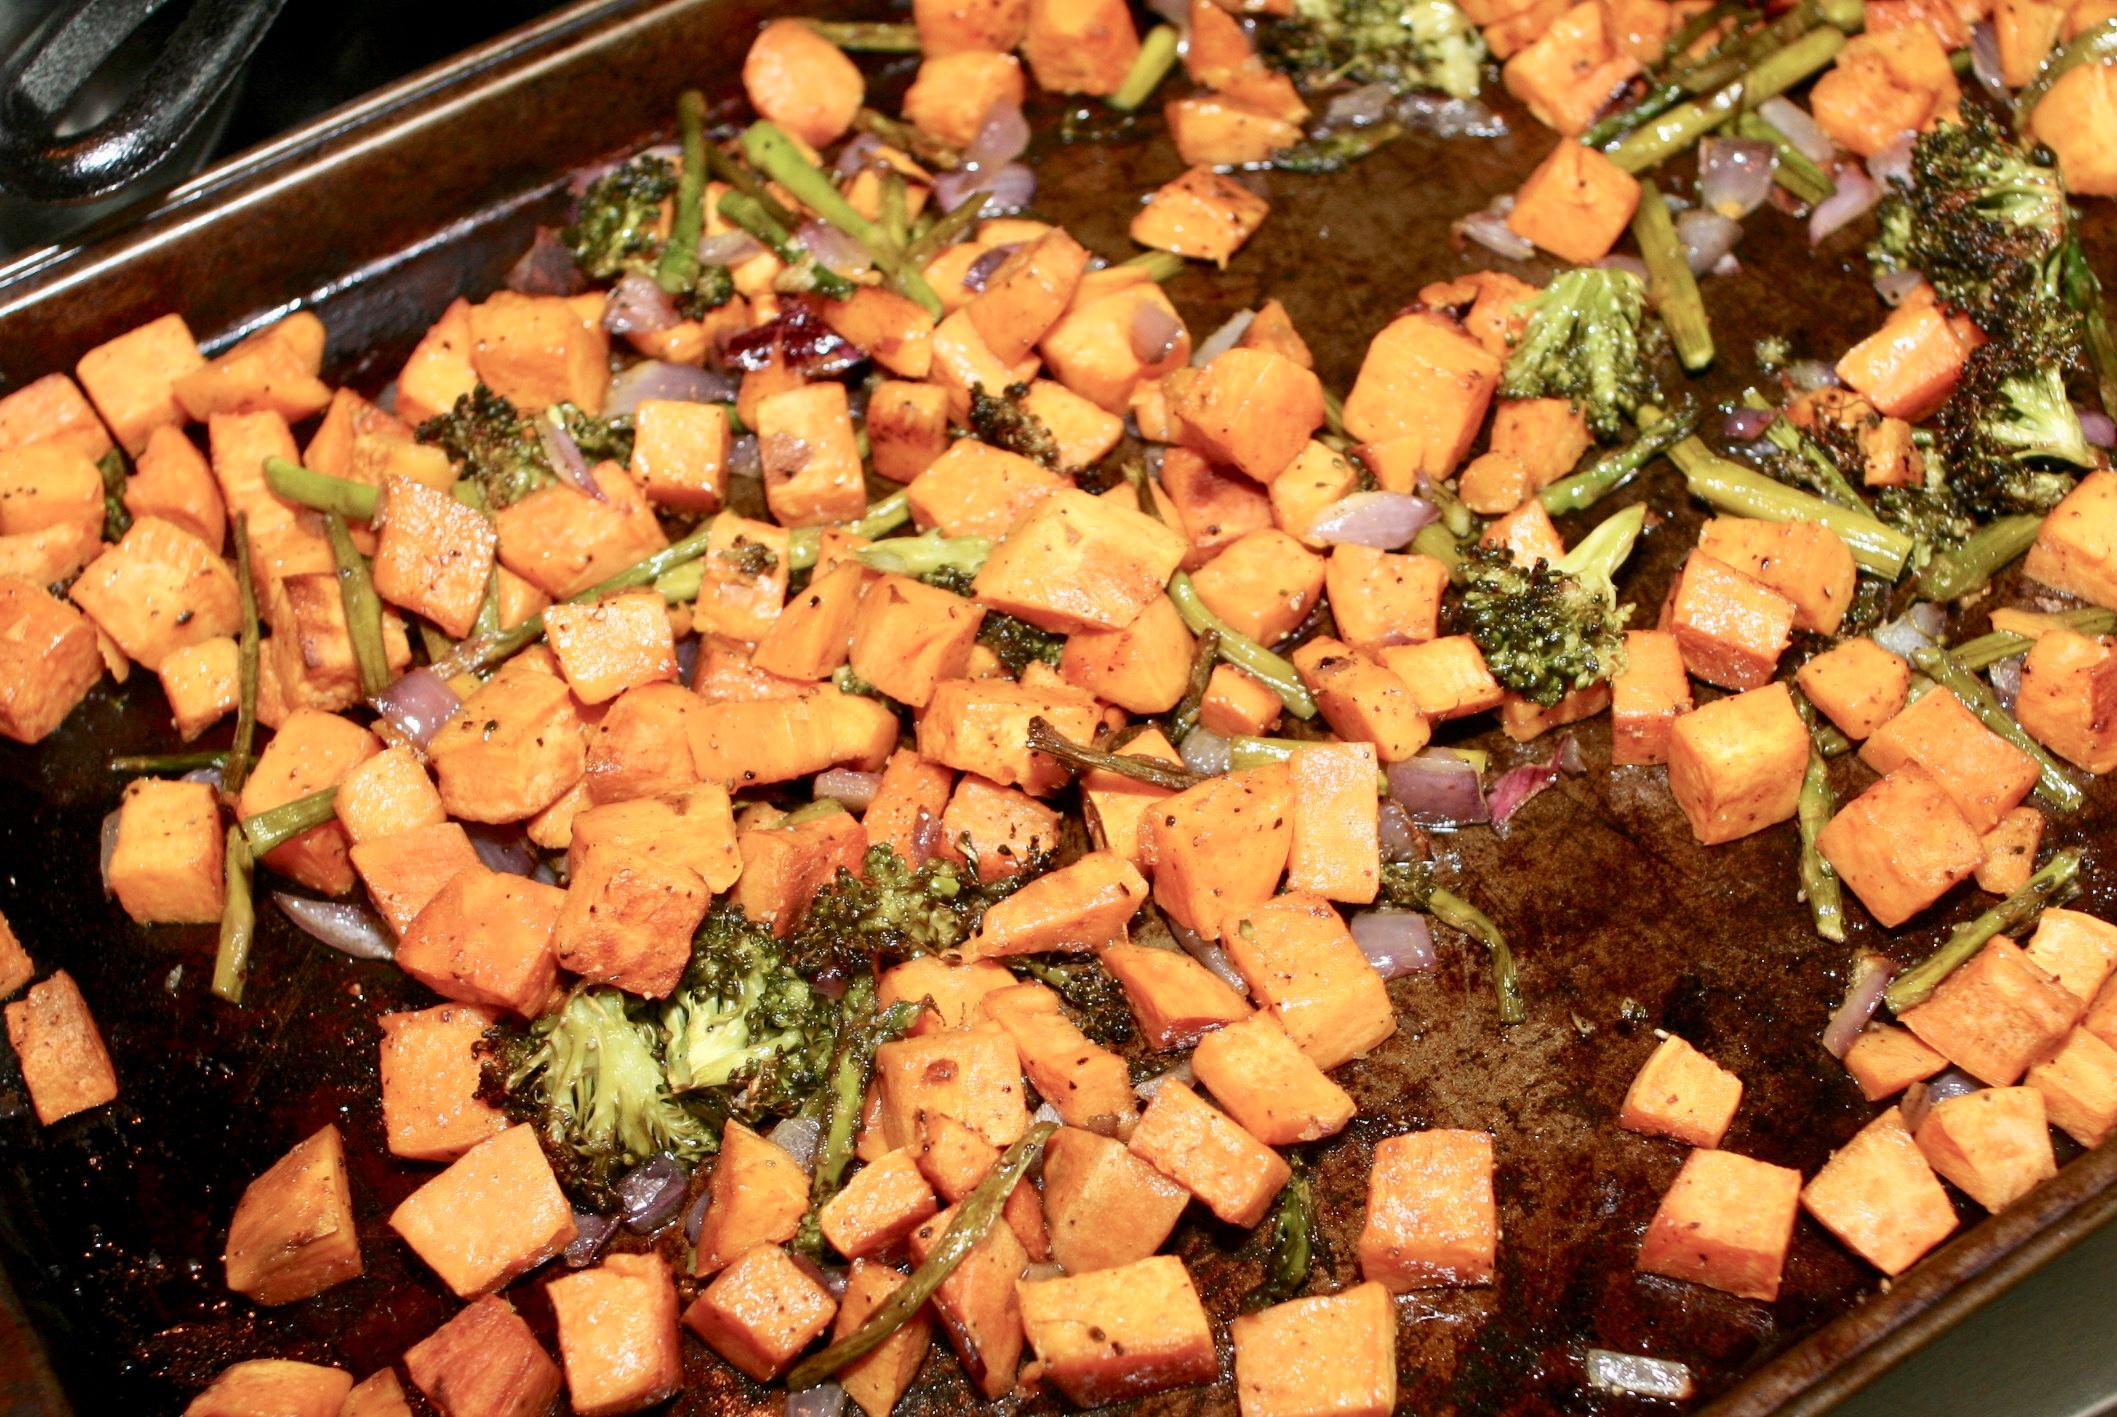 roasted sweet potatoes and veggies